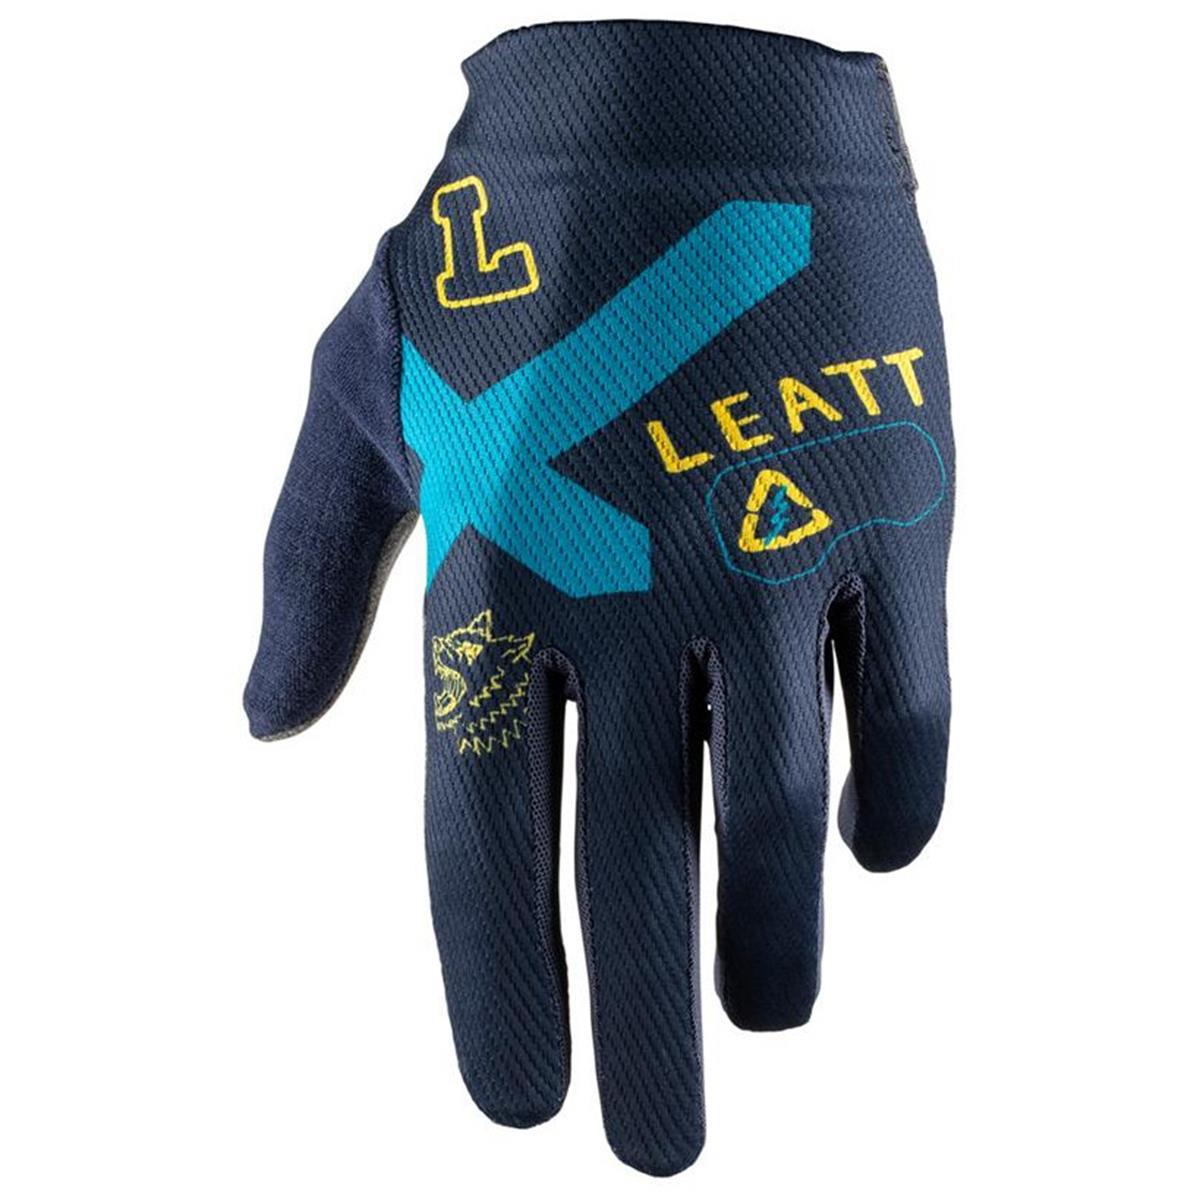 Leatt Bike-Handschuhe DBX 1.0 GripR X-Ink